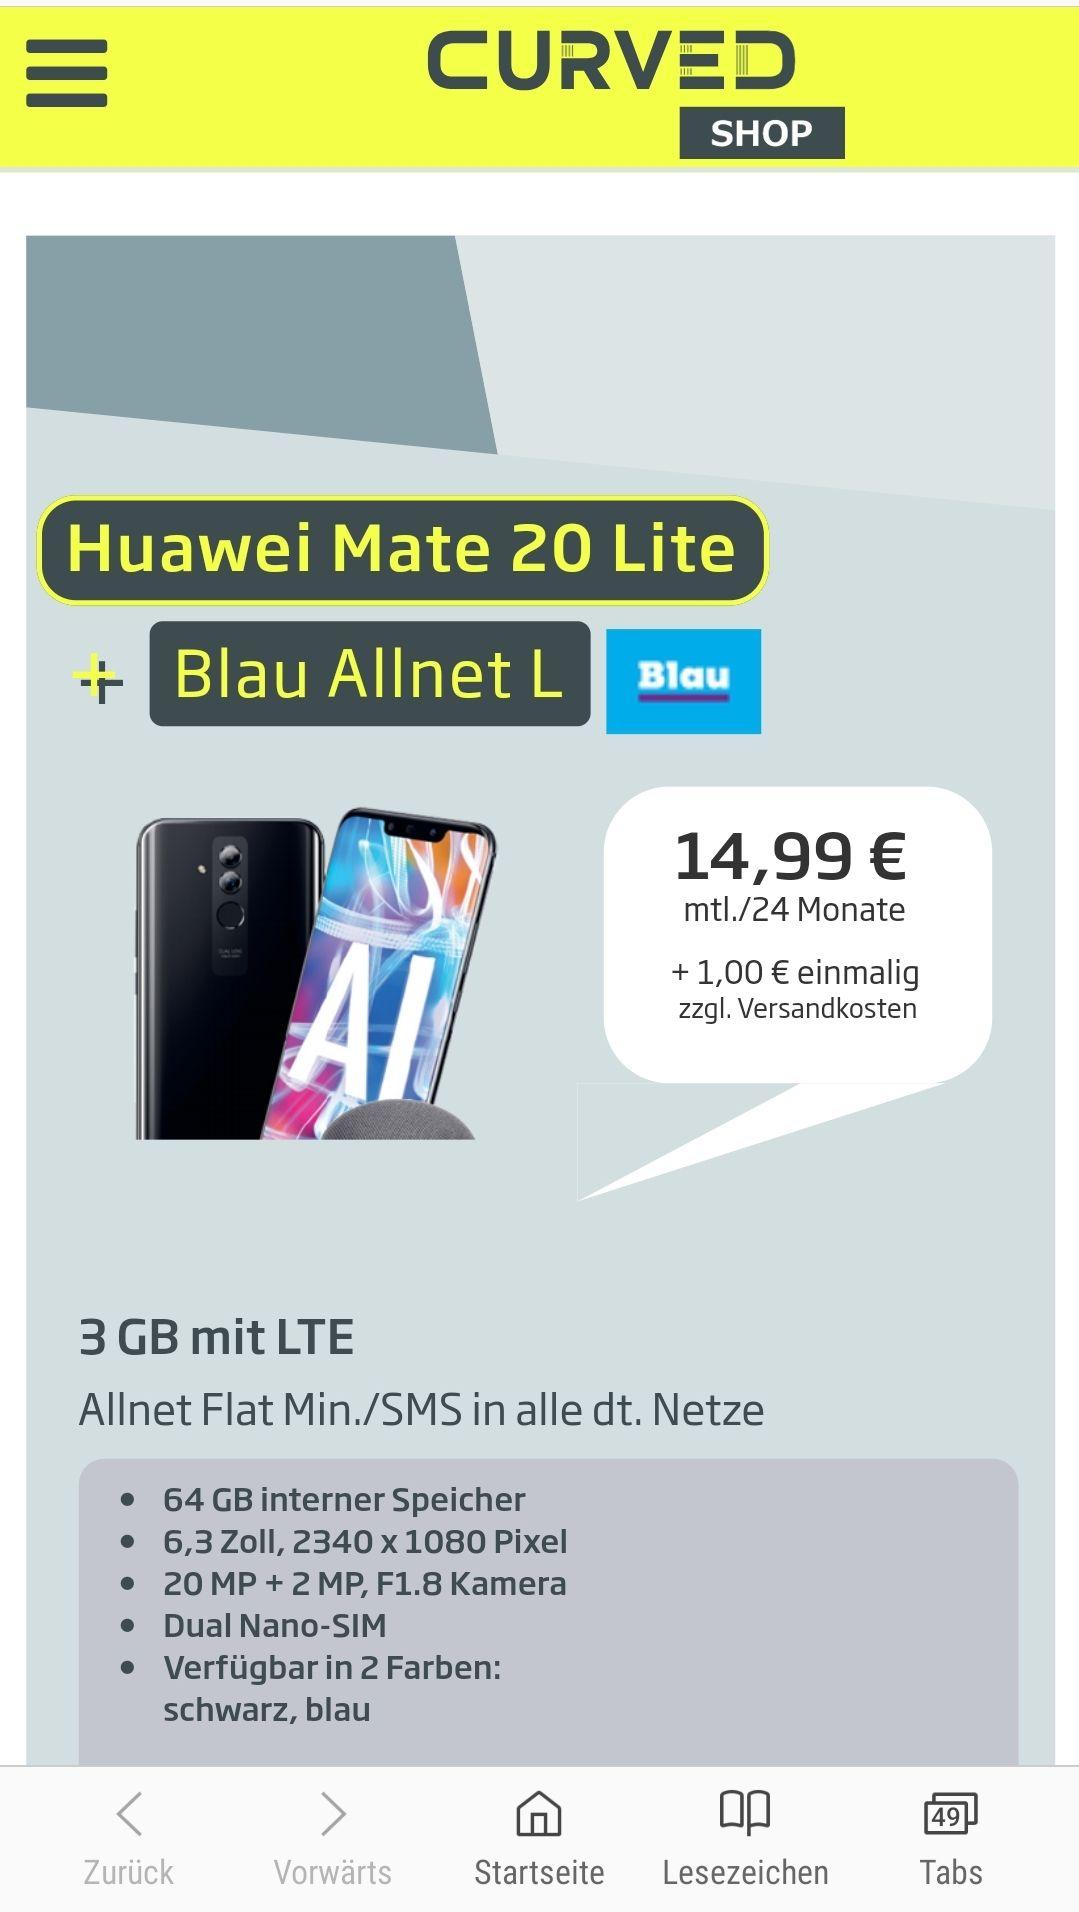 Huawei MATE 20 lite + SoundStone CM51 + Blau Allnet Flat 3 GB effektiv 4,80€/Monat